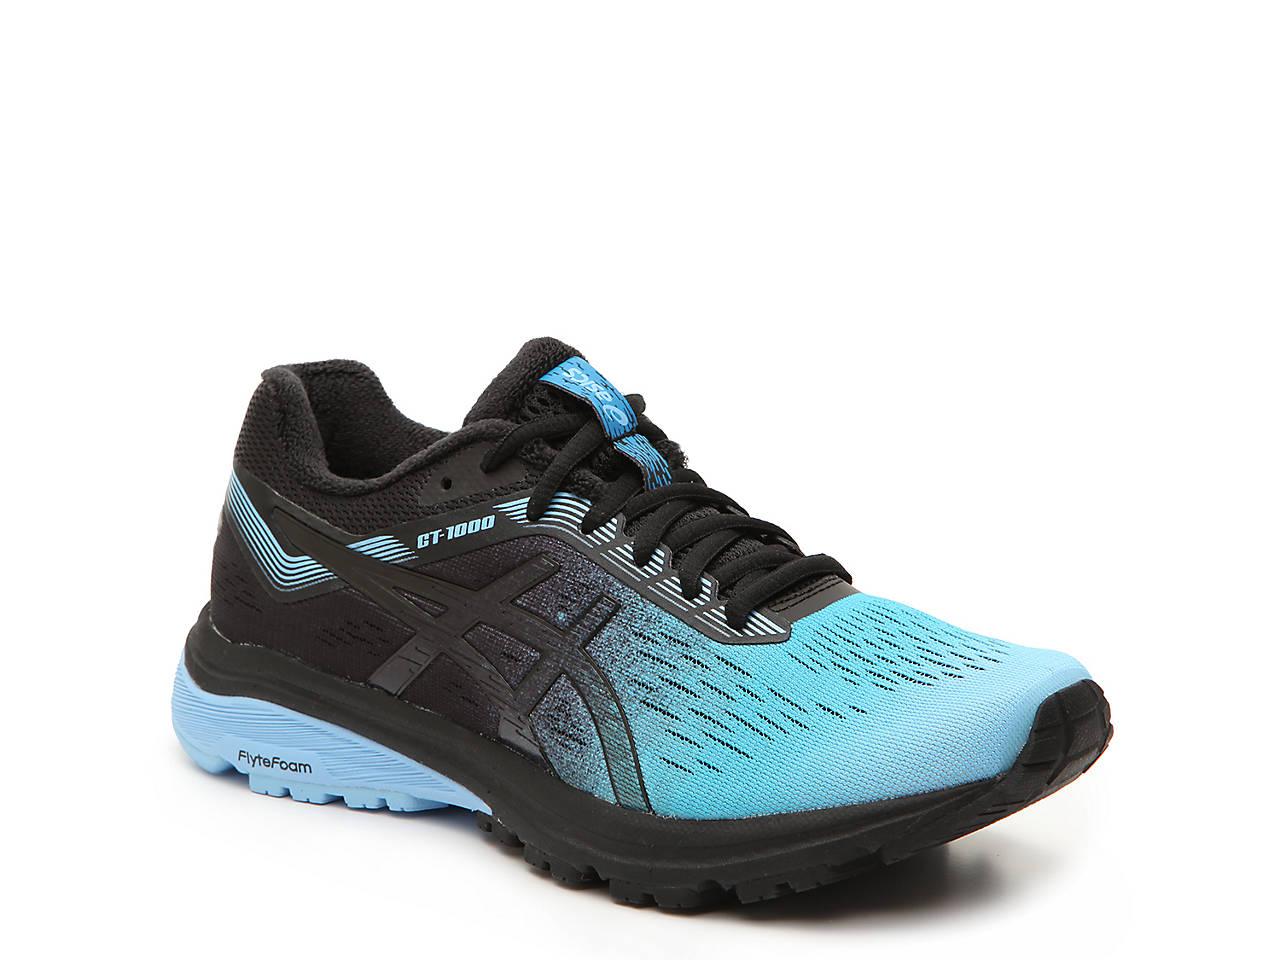 82ef4aa706 ASICS GT-1000 7 Performance Running Shoe - Women s Women s Shoes